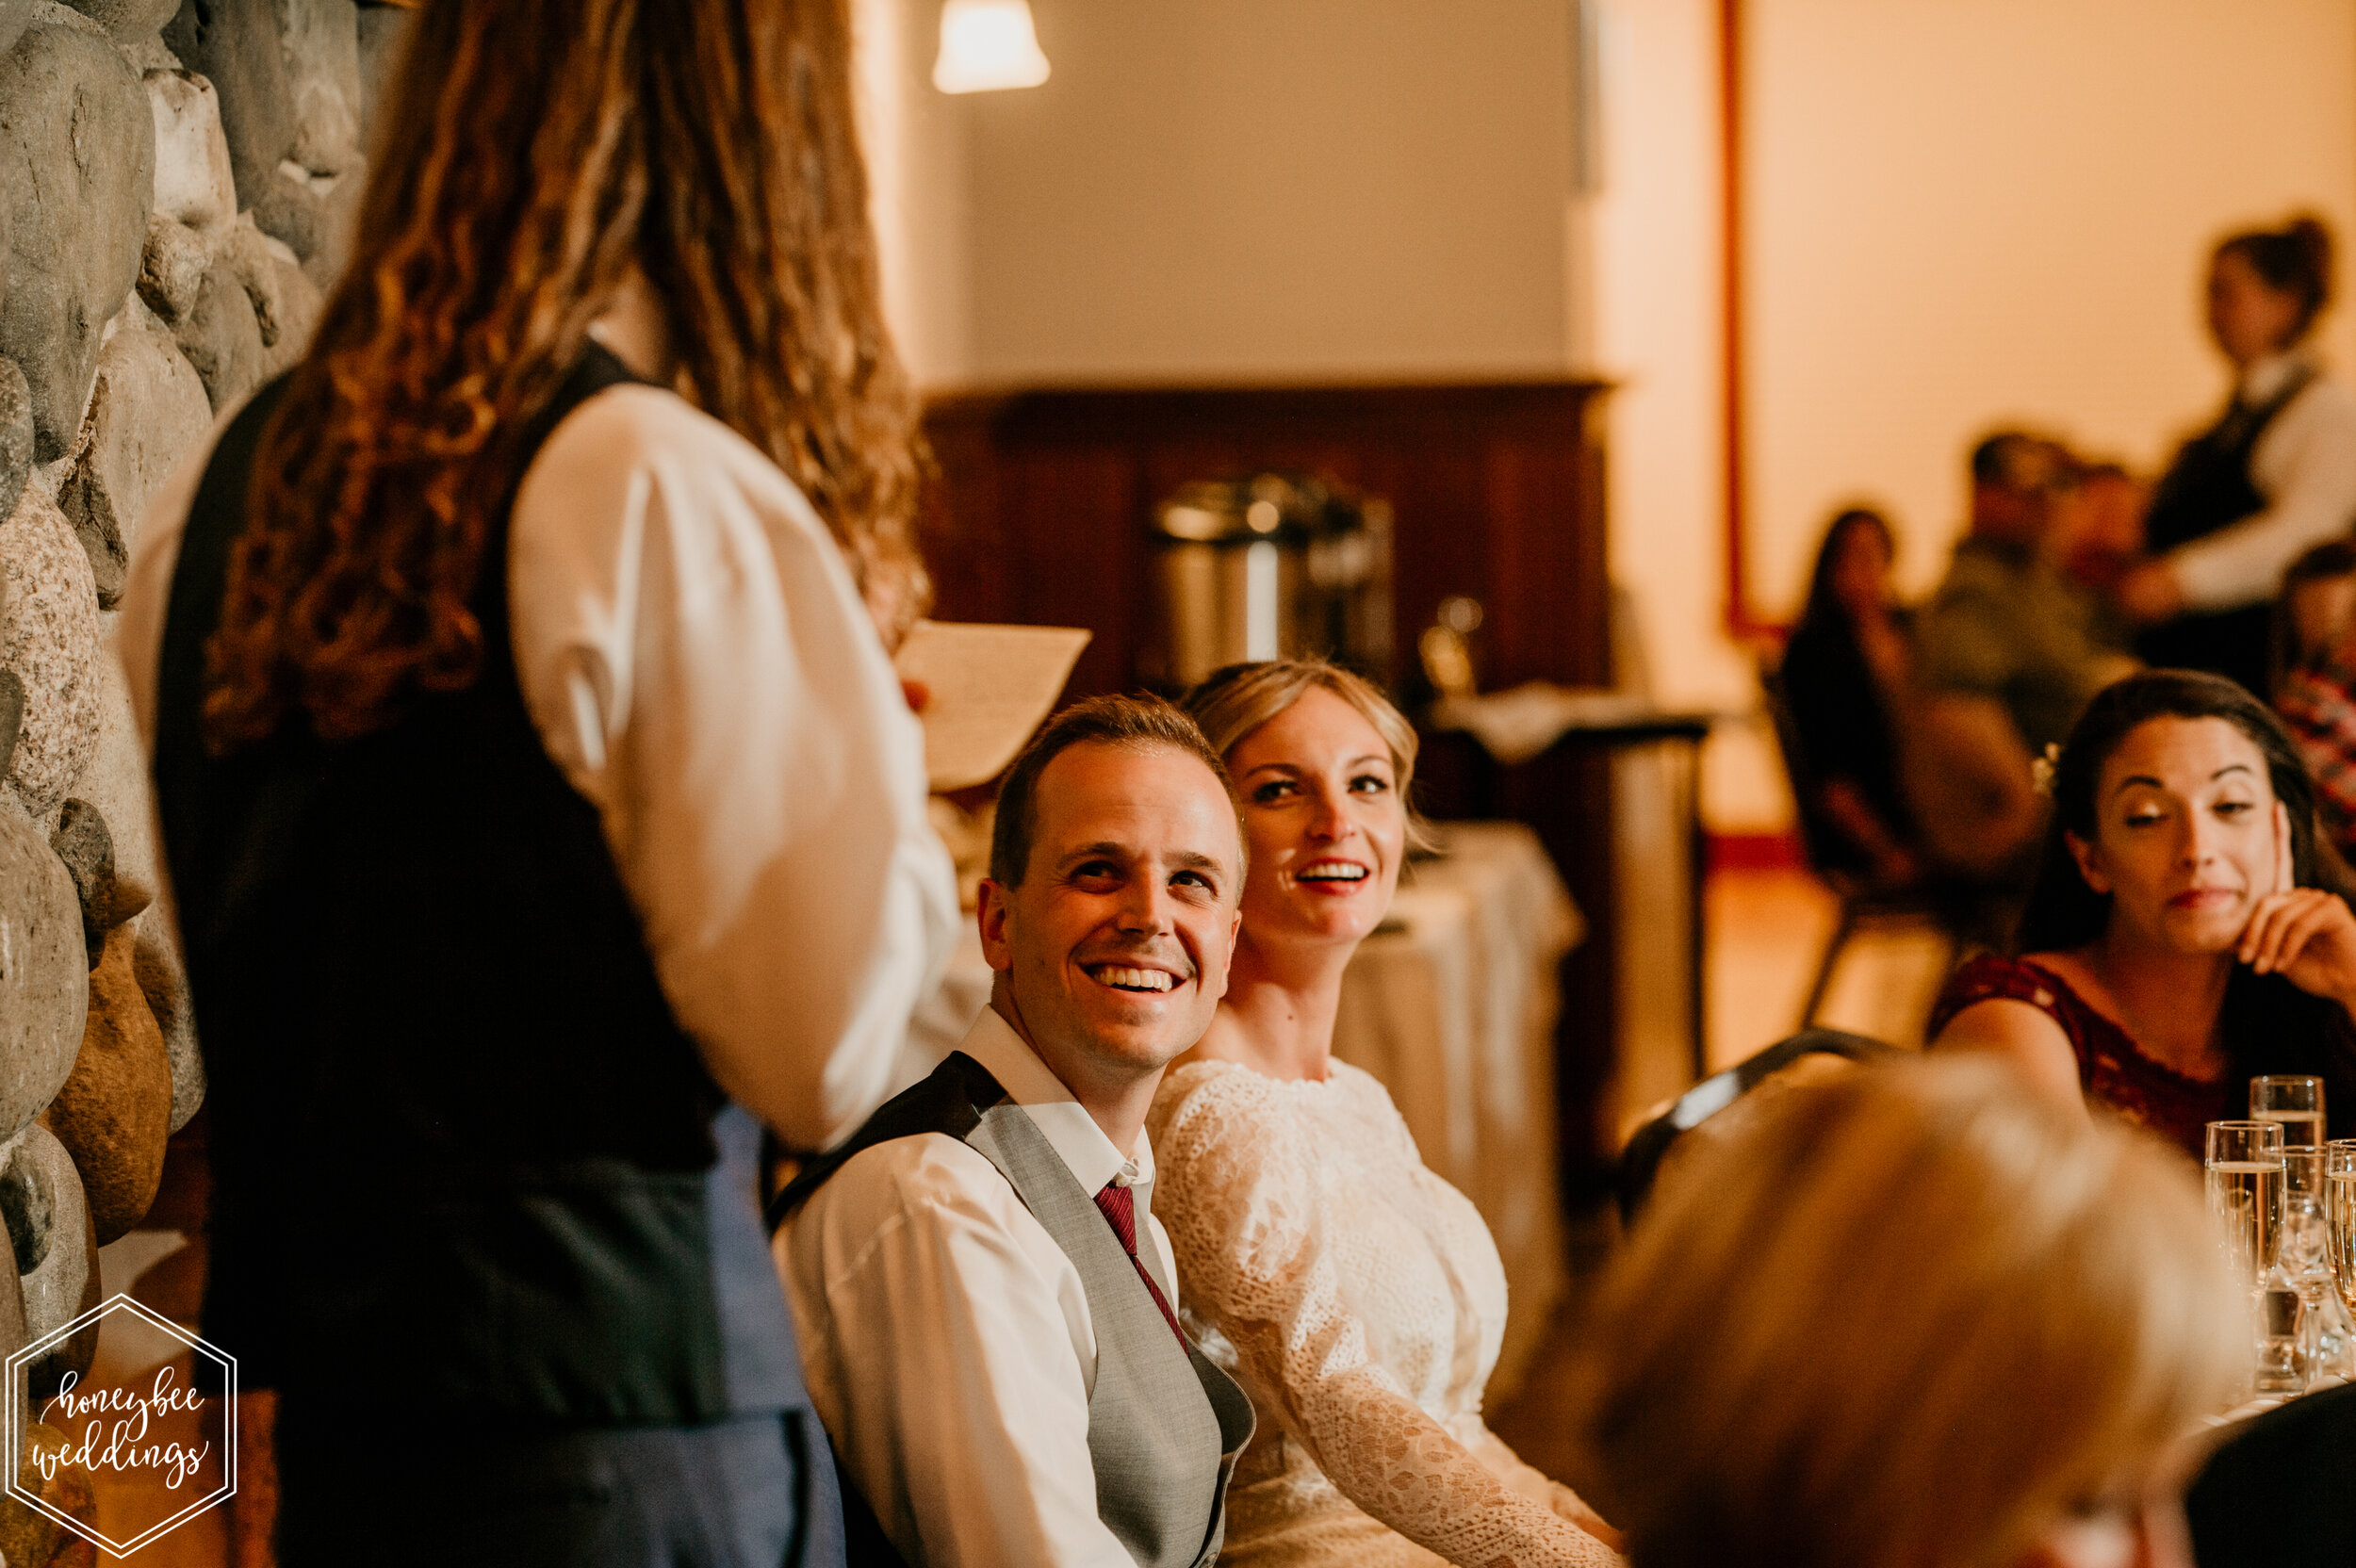 164Chico Hot Springs Wedding_Montana Wedding Photographer_Winter Wedding_Ariel & Richard_October 12, 2019-752.jpg